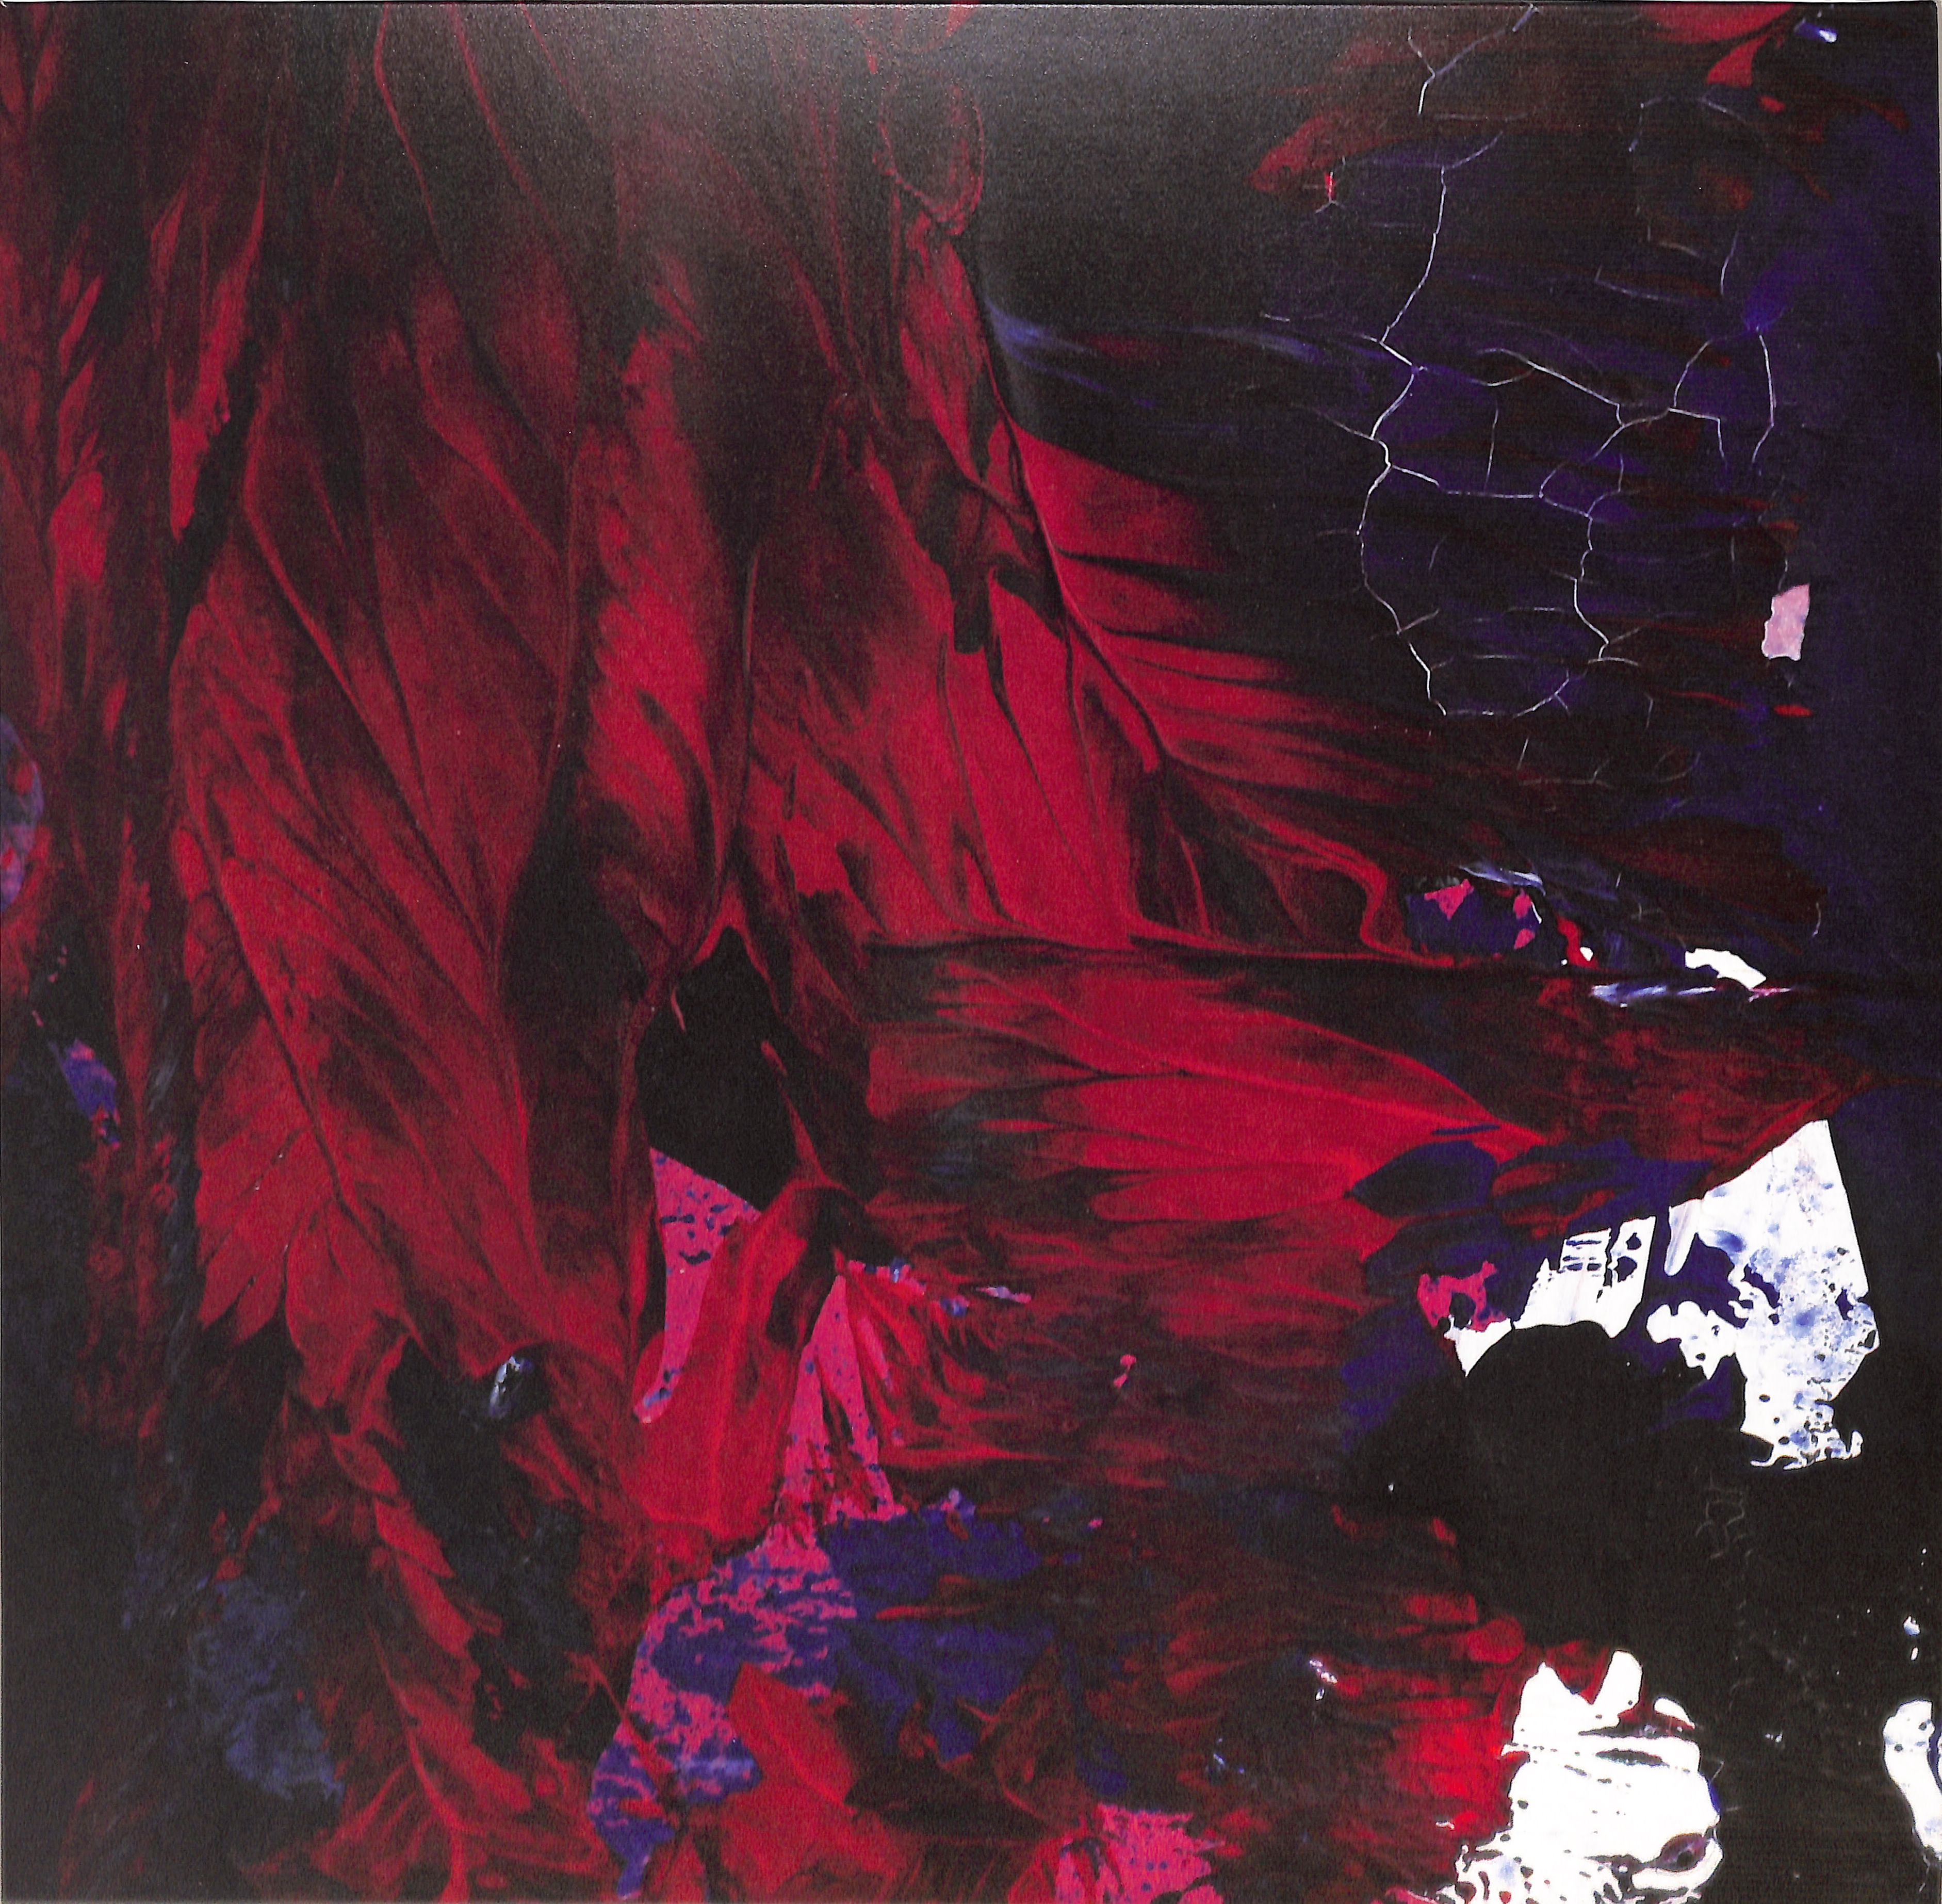 Raborb - MYSTIC FOLLOWERS